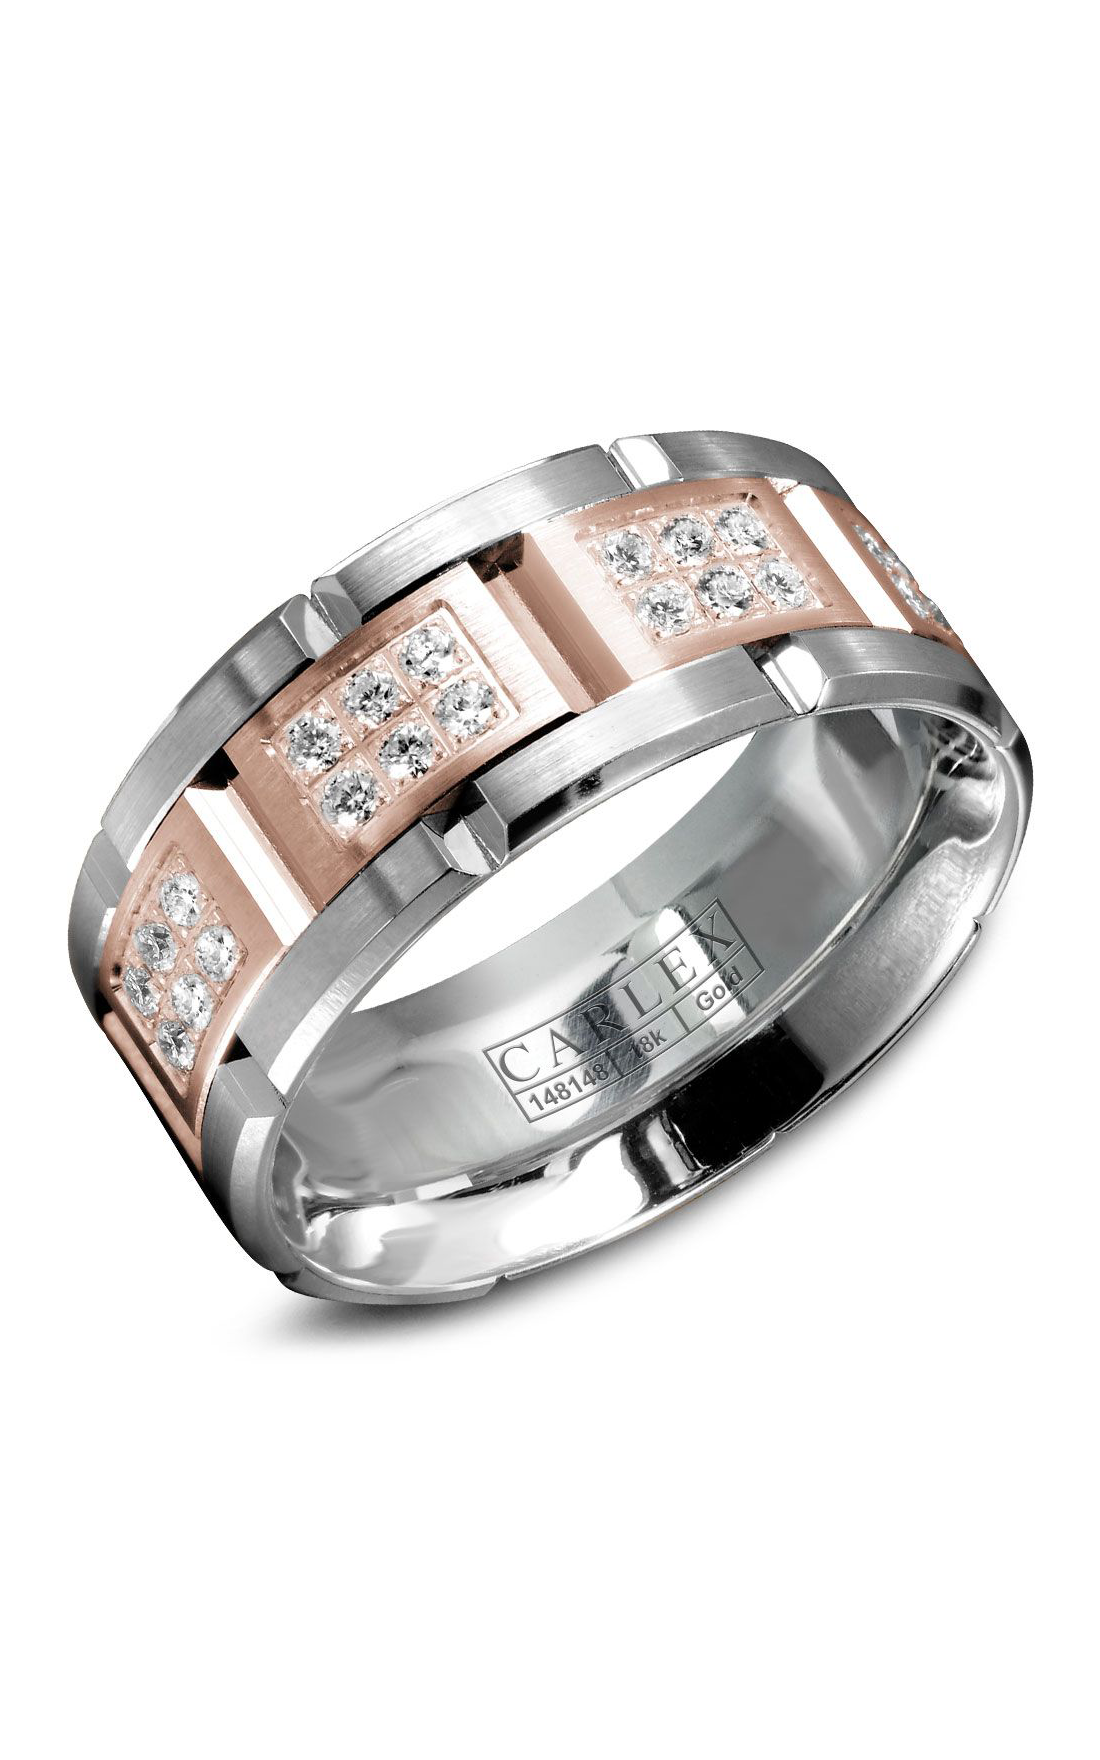 Carlex G1 Men's Wedding Band WB-9155RW product image